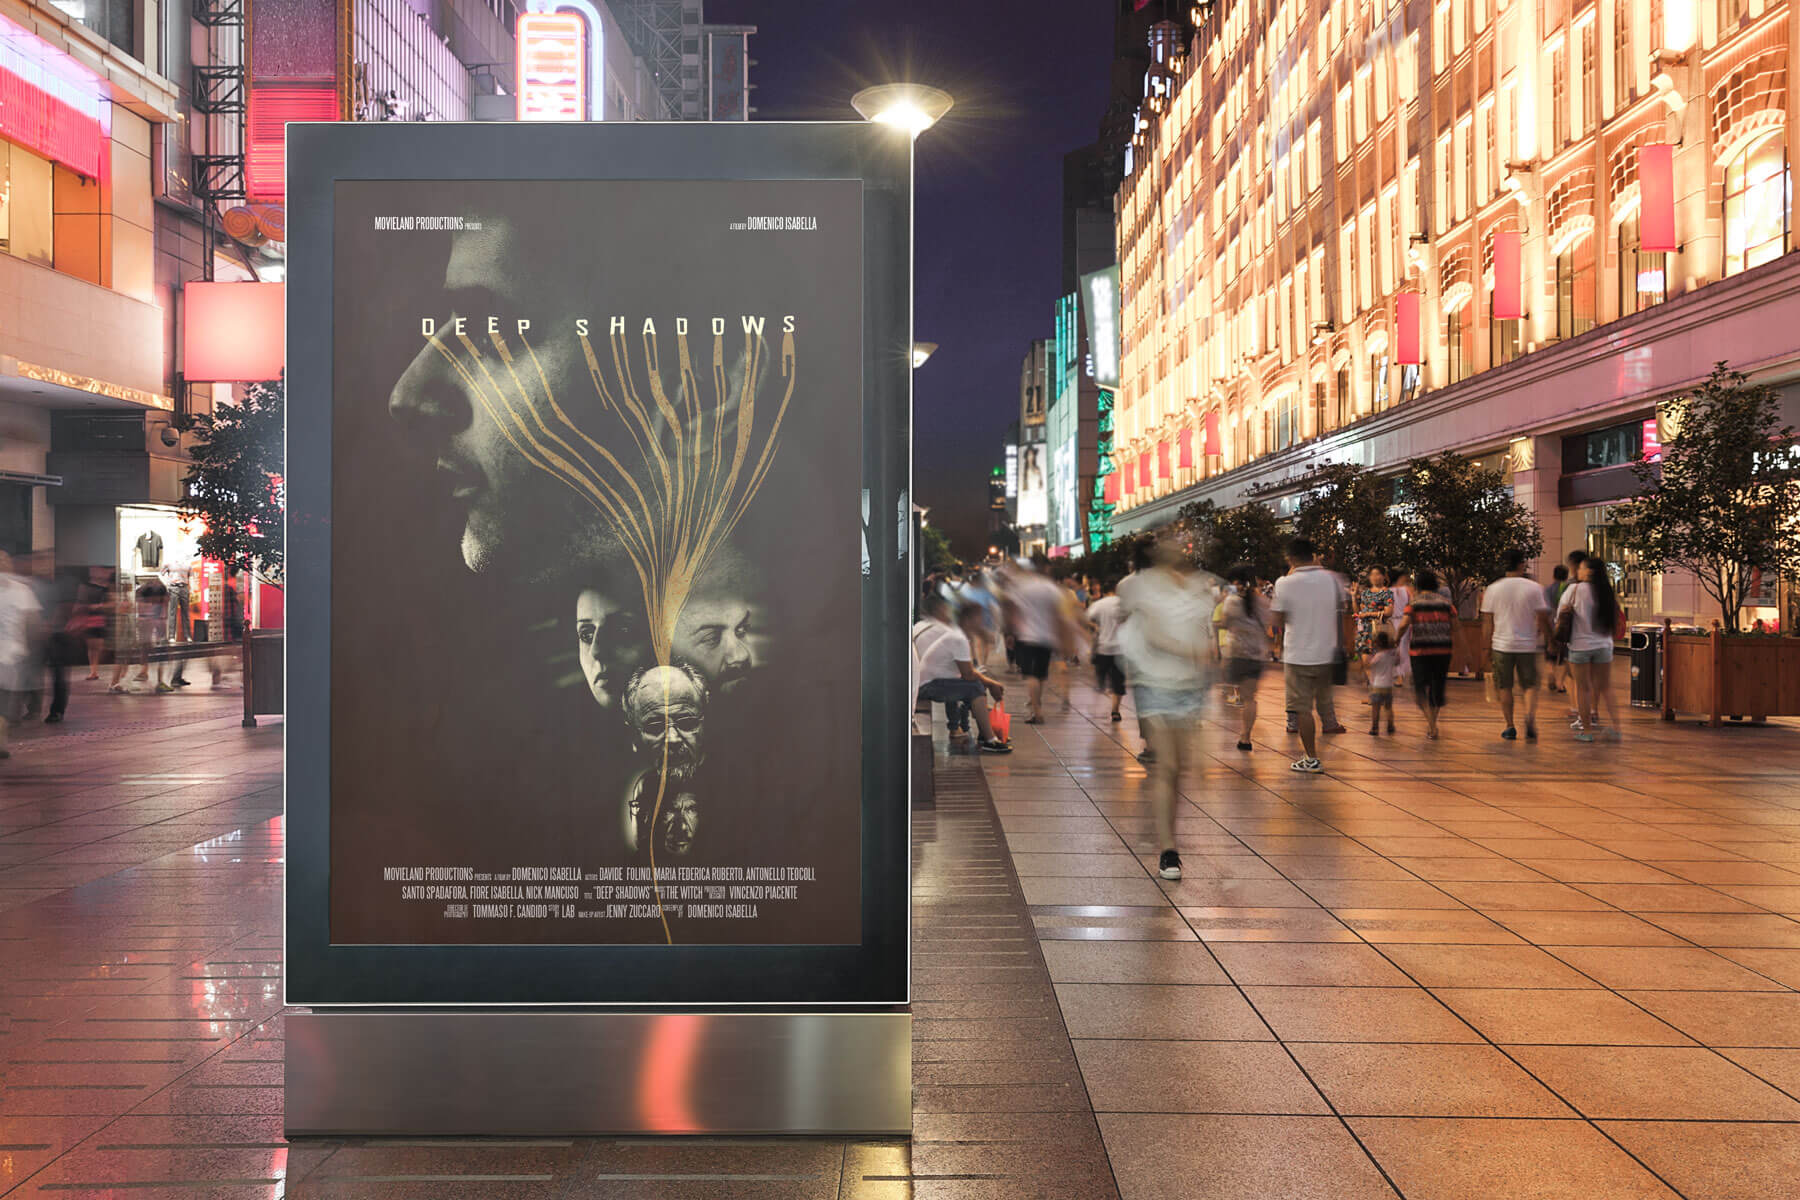 Bcreativeanddesign-deepshadows-vincenzo-piacente-poster